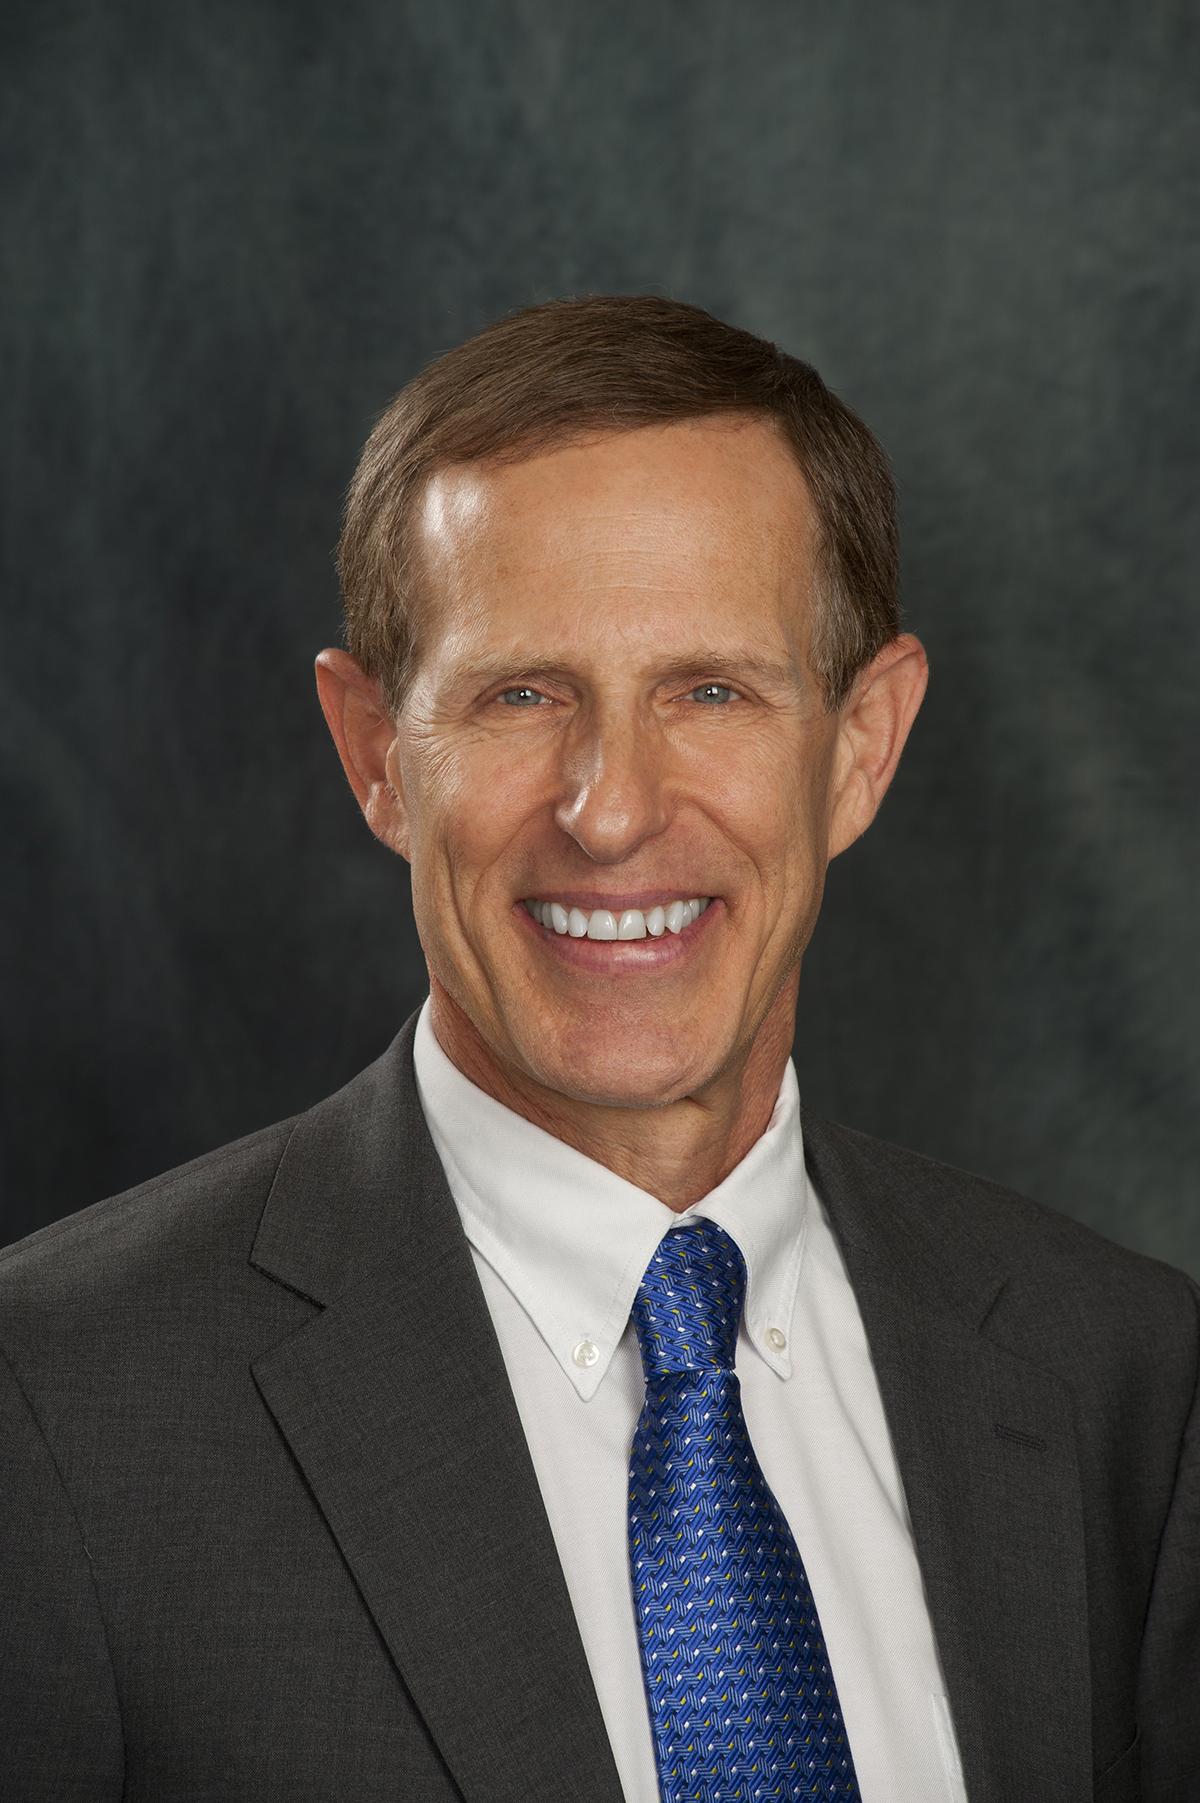 Andrew Gerber Wikipedia